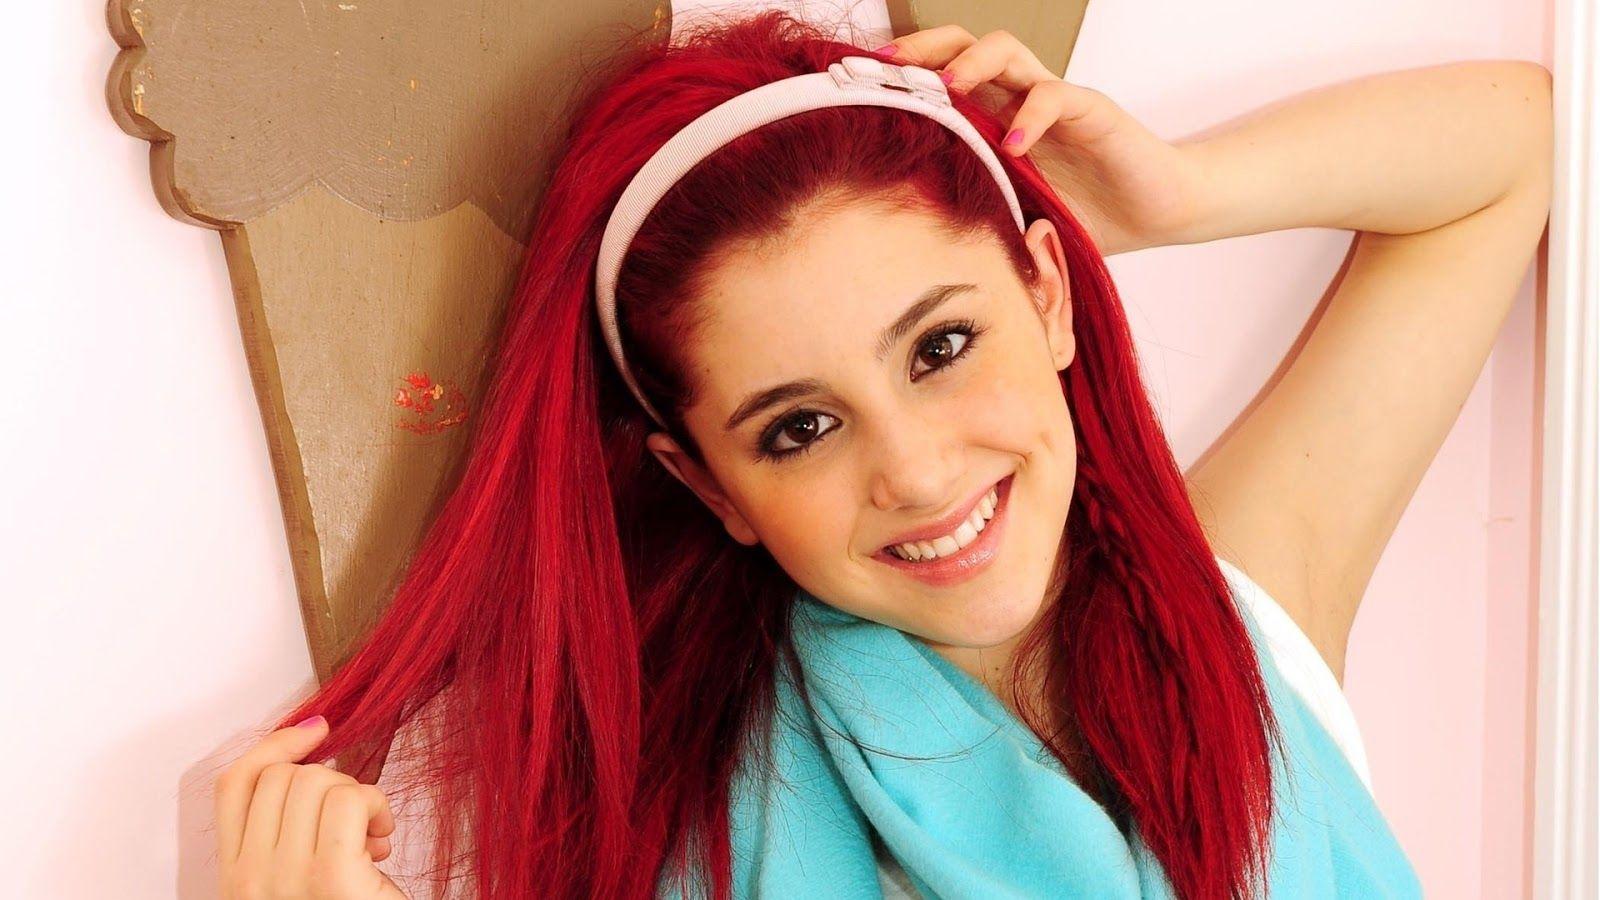 Ariana grande HD Wallpapers, Desktop ...